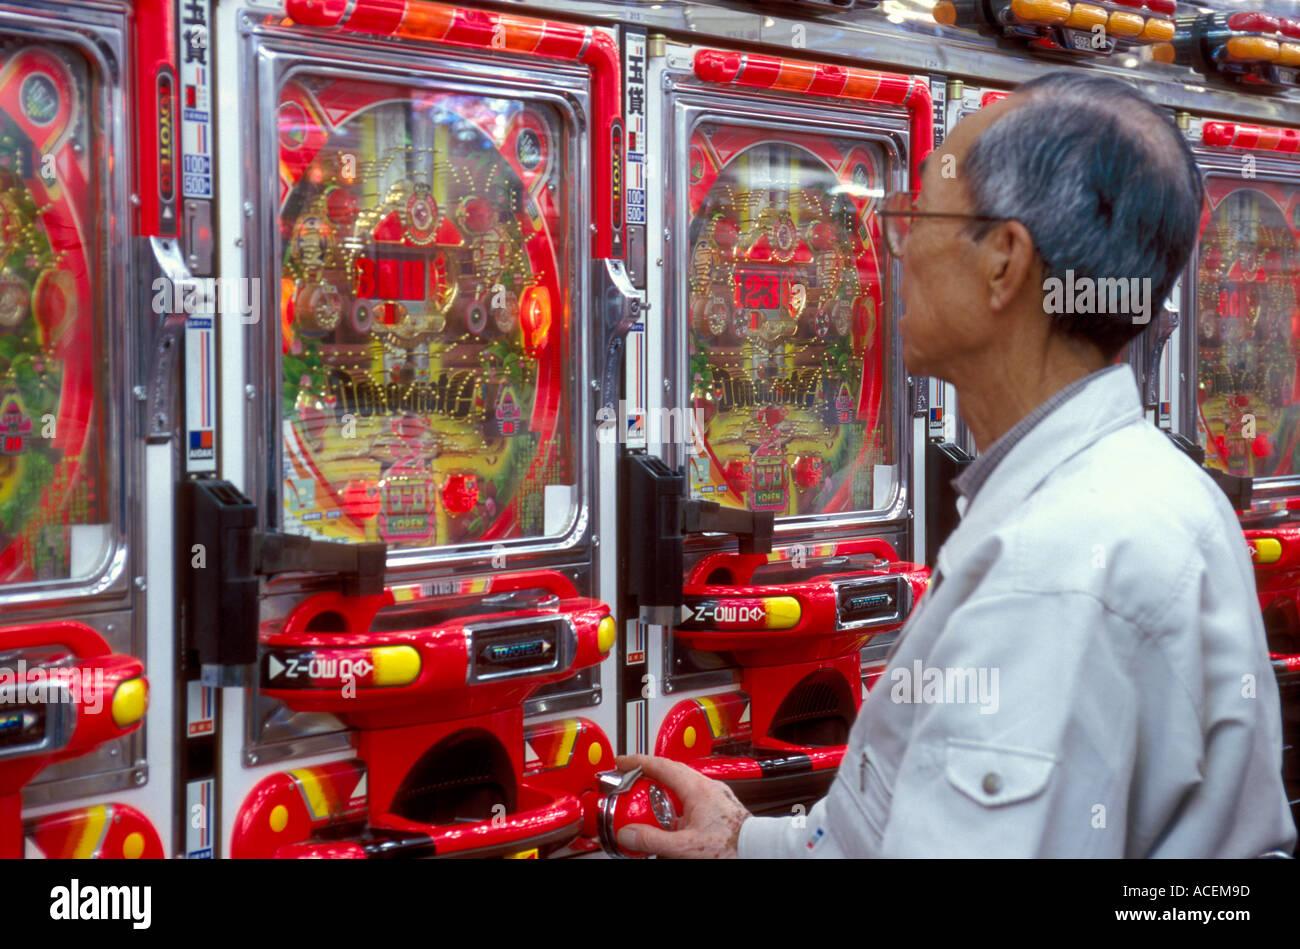 Japanese gambling games wisconsin council on problem gambling